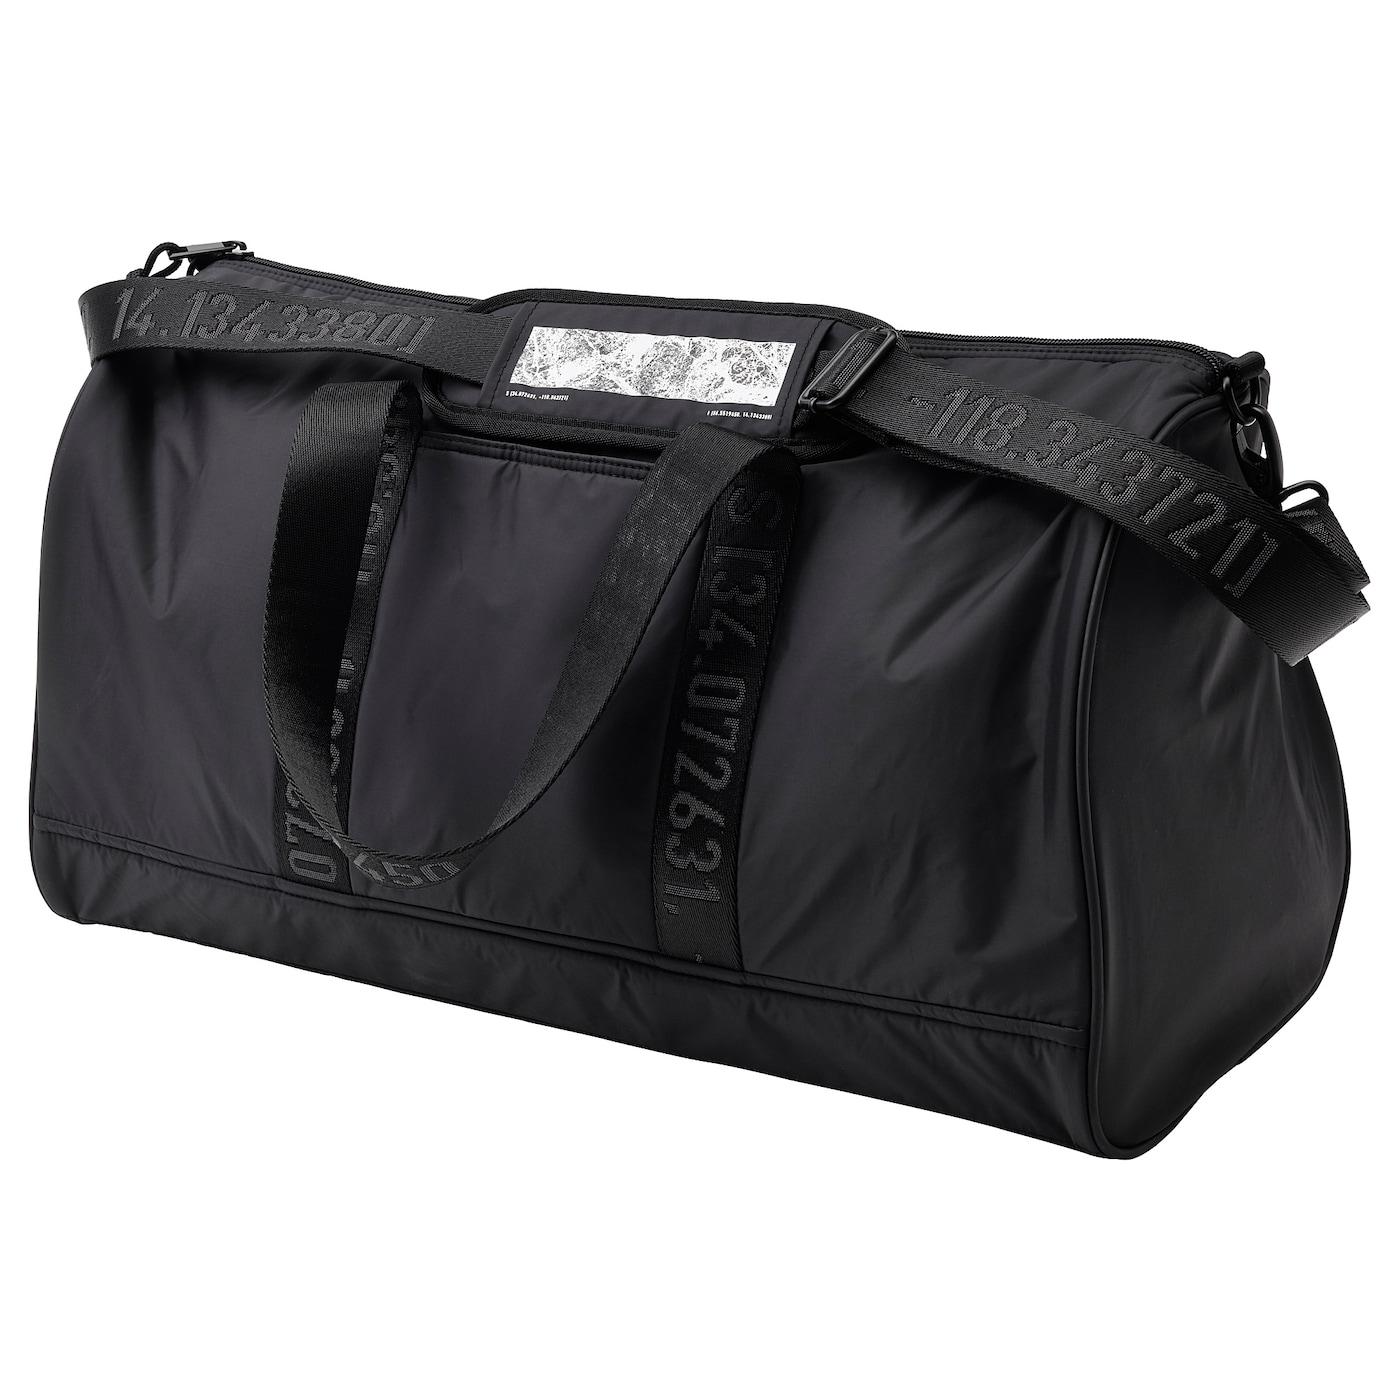 sacs sacs dos sacs et sacs dos de voyage ikea. Black Bedroom Furniture Sets. Home Design Ideas